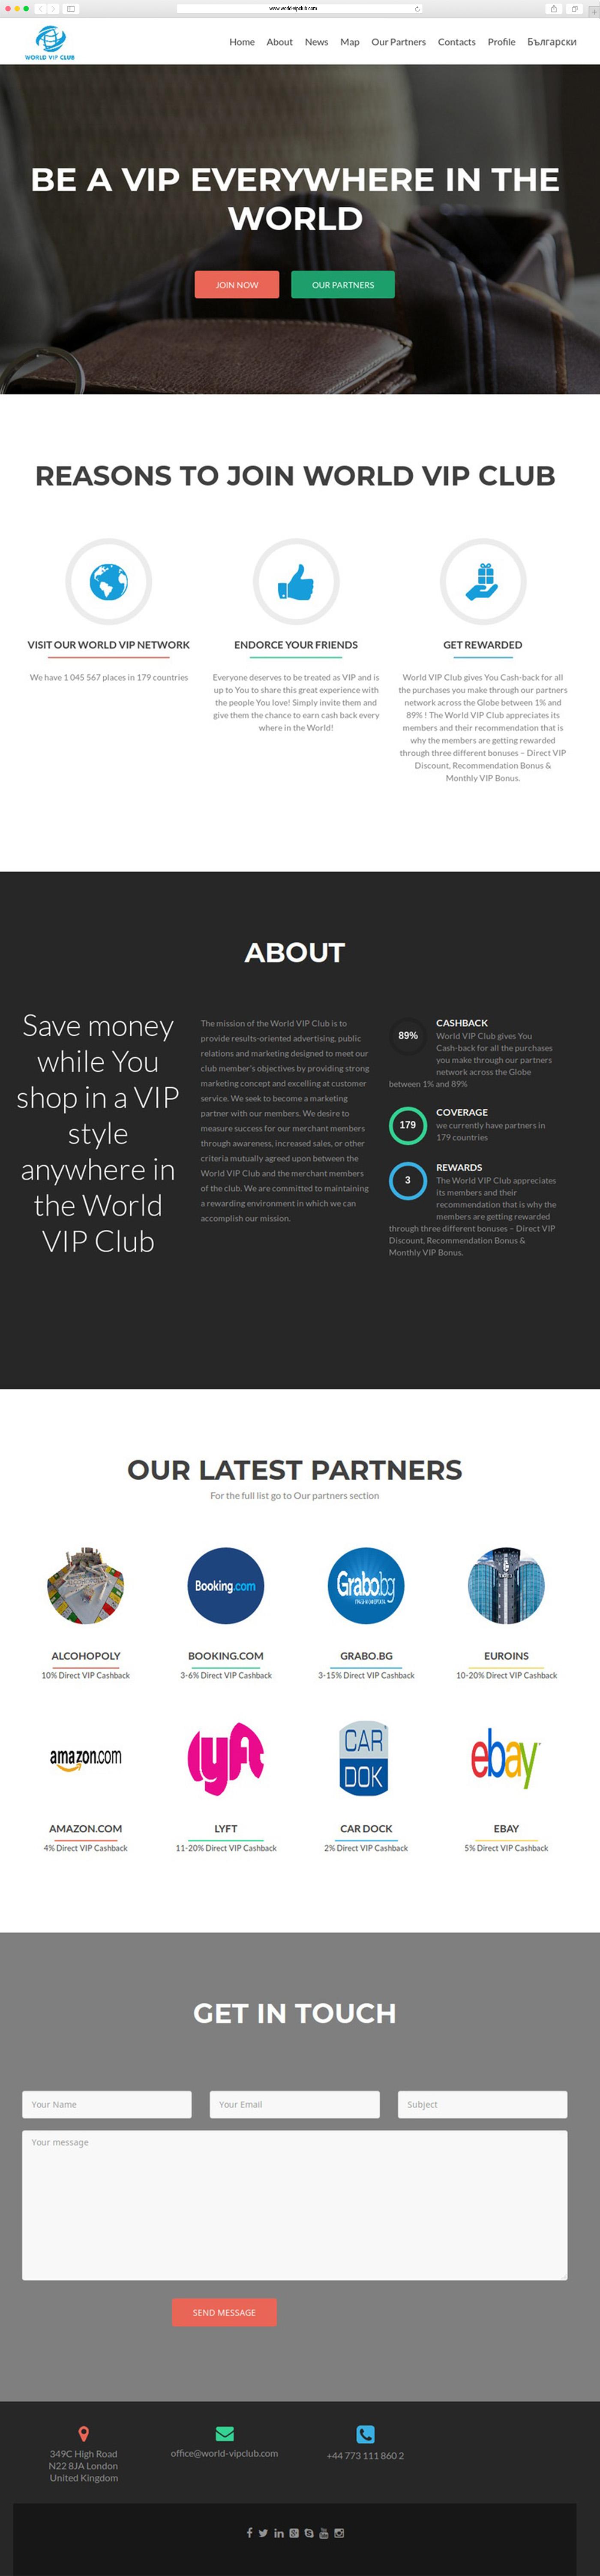 World Vip Club